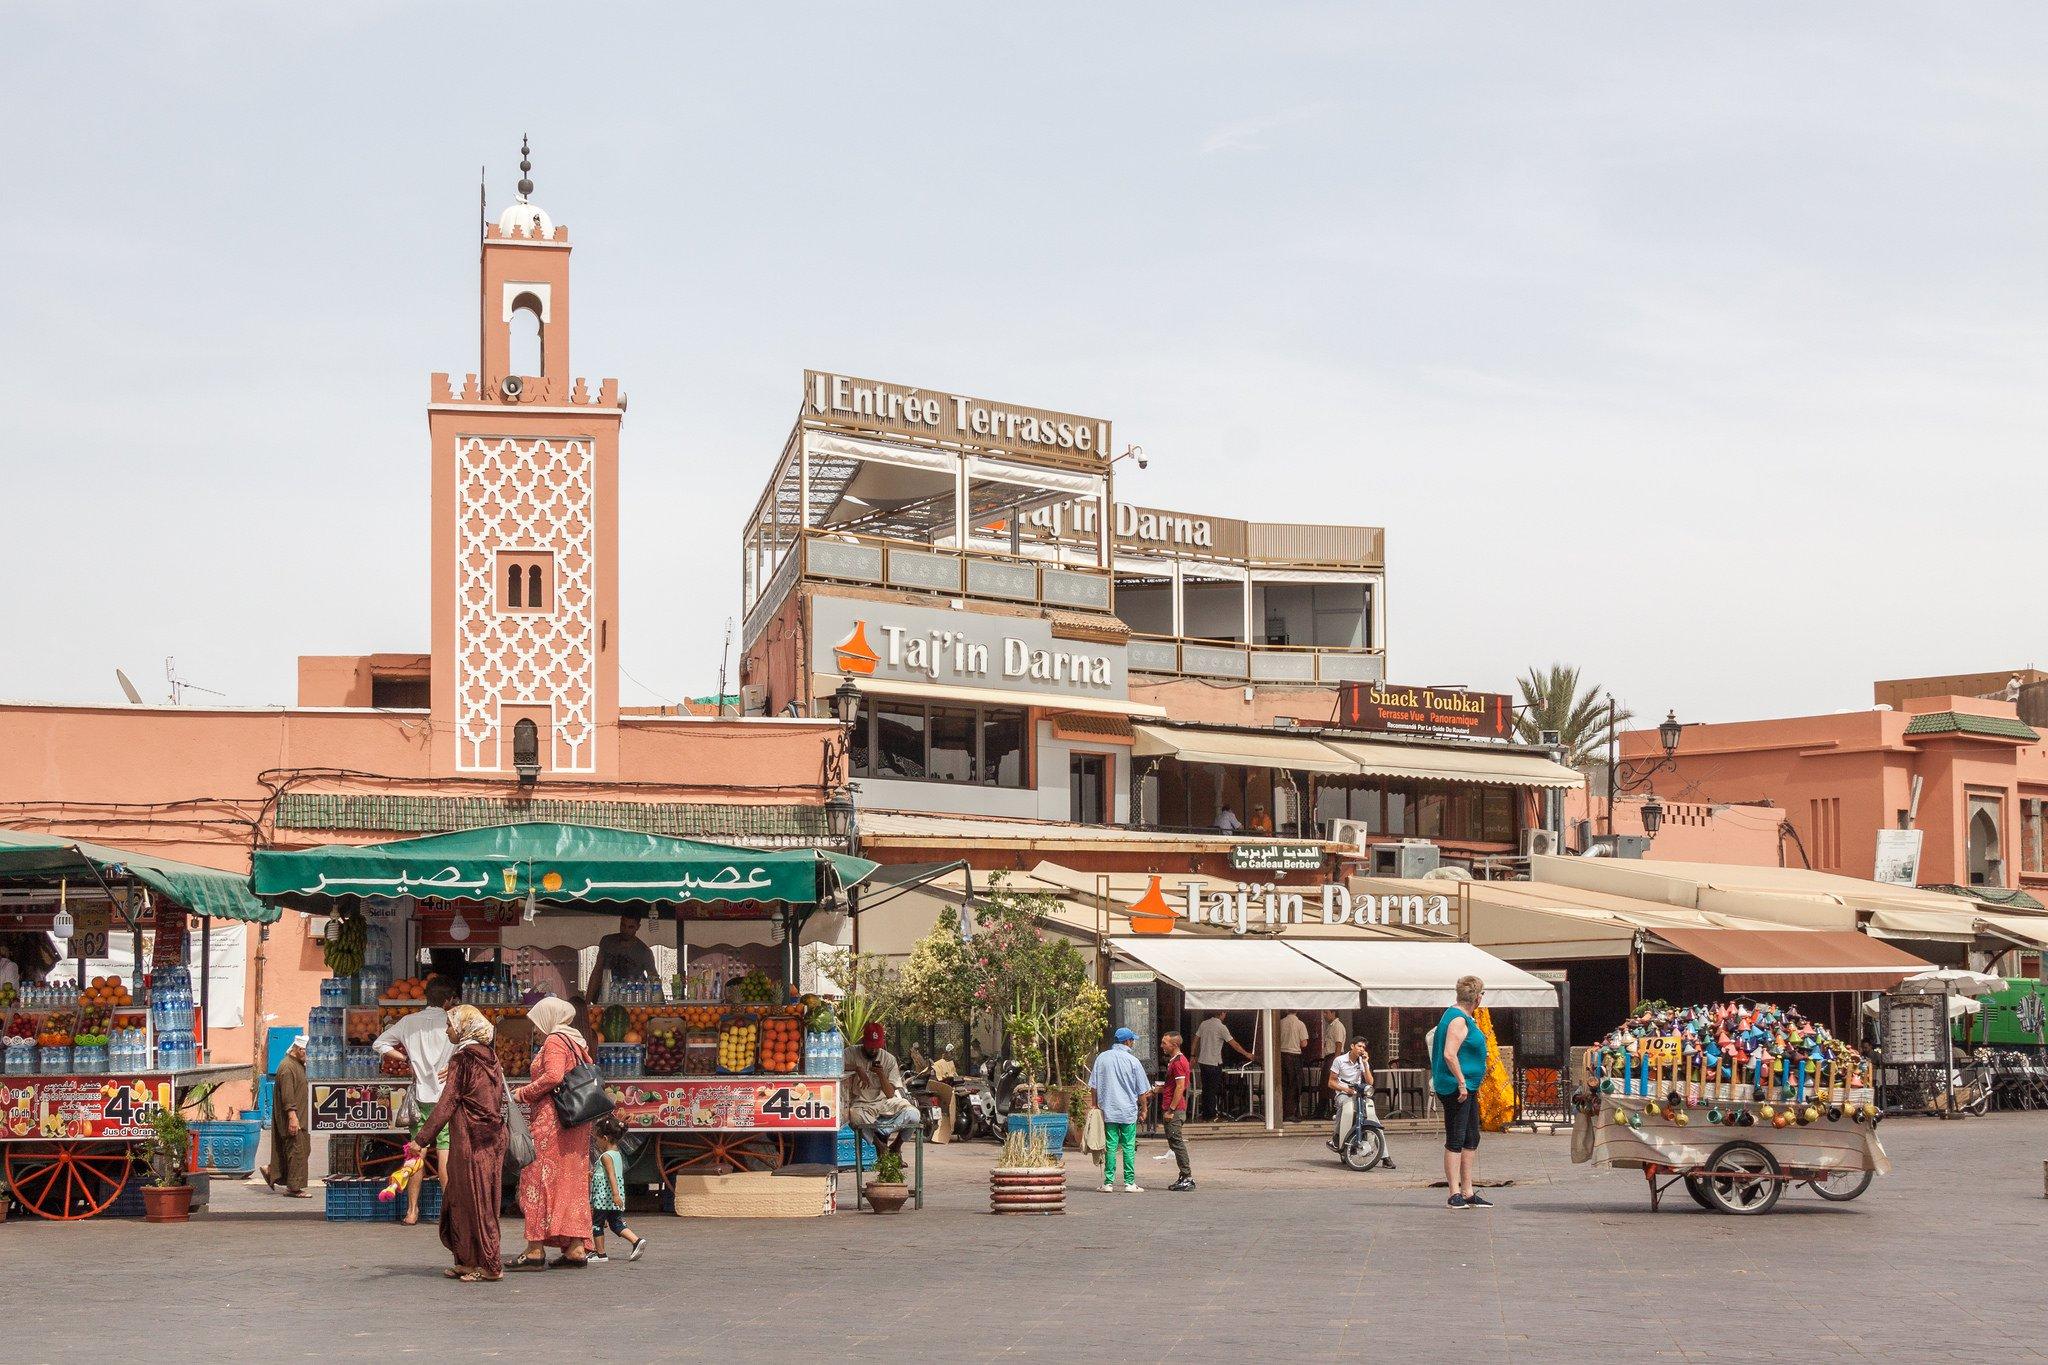 Marrakesh Morocco Jemaa el Fna Main Square